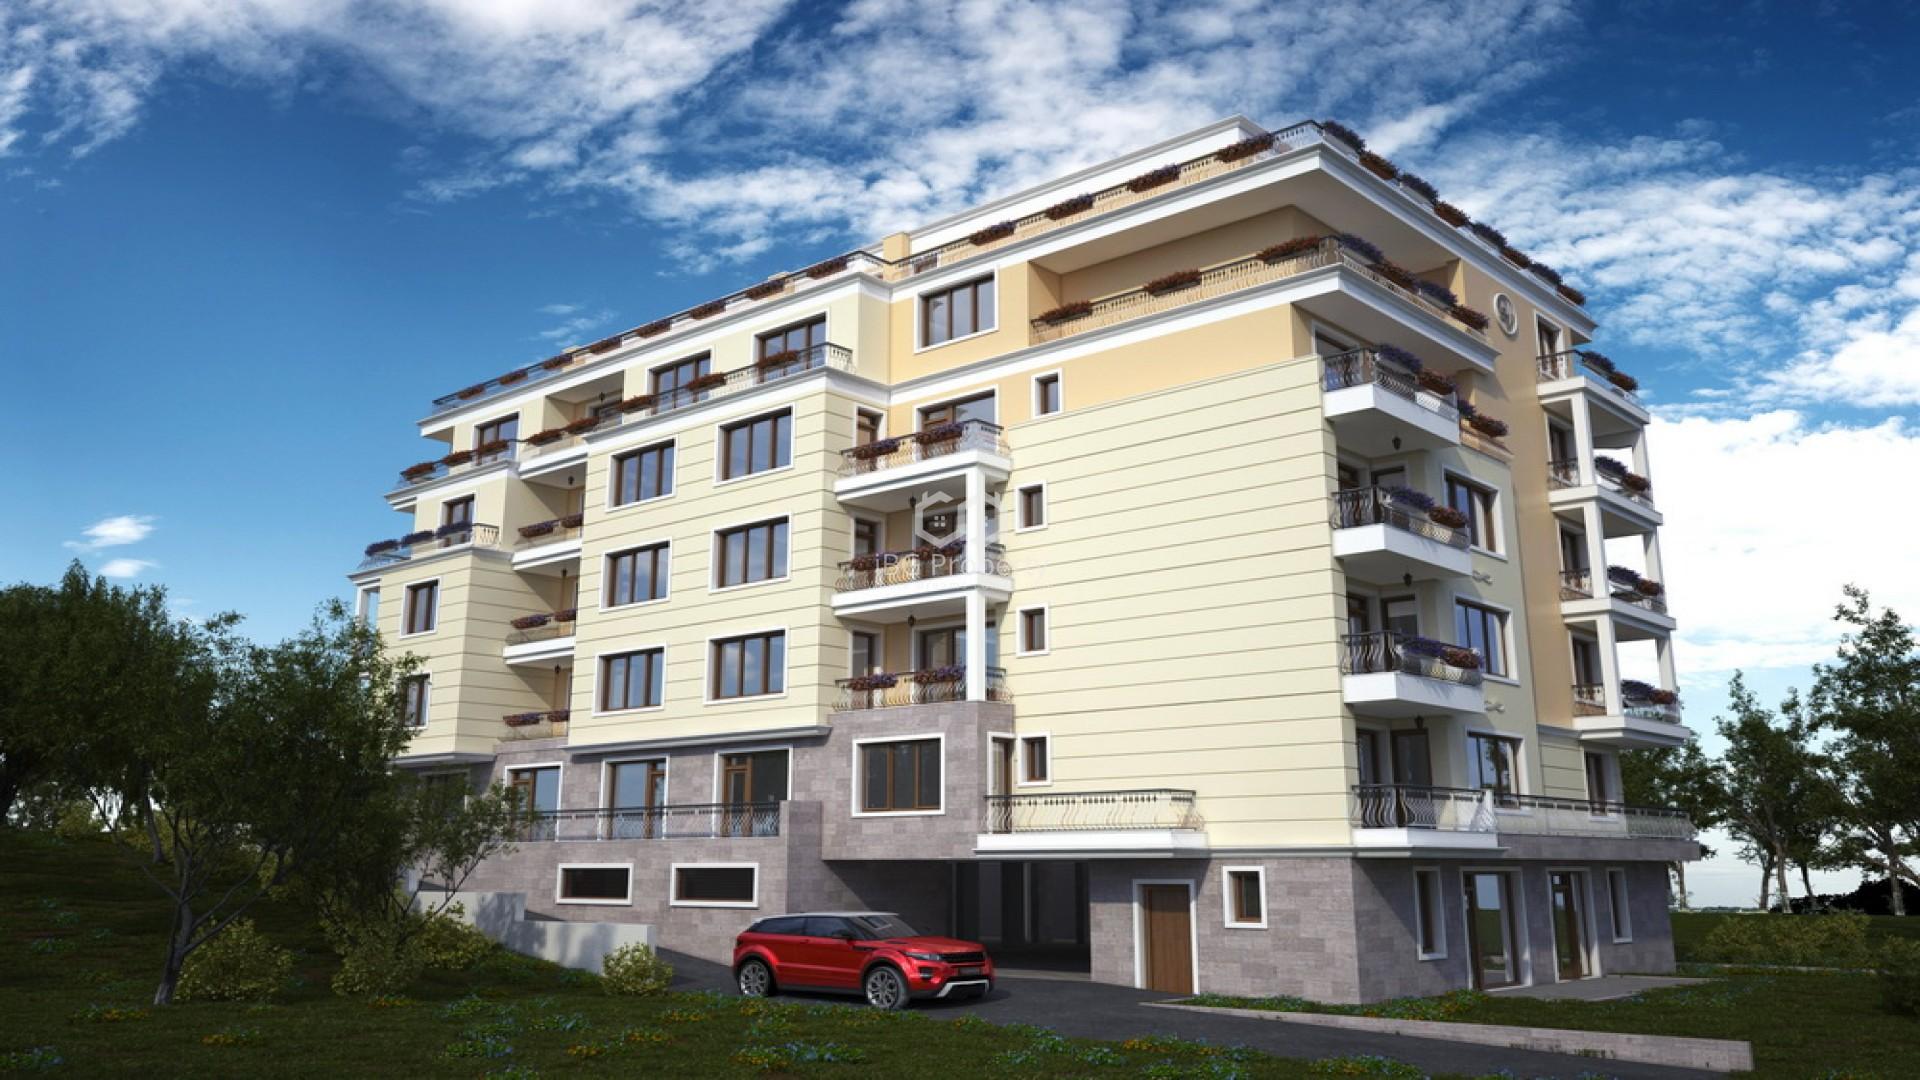 Едностаен апартамент Свети Влас 31 m2